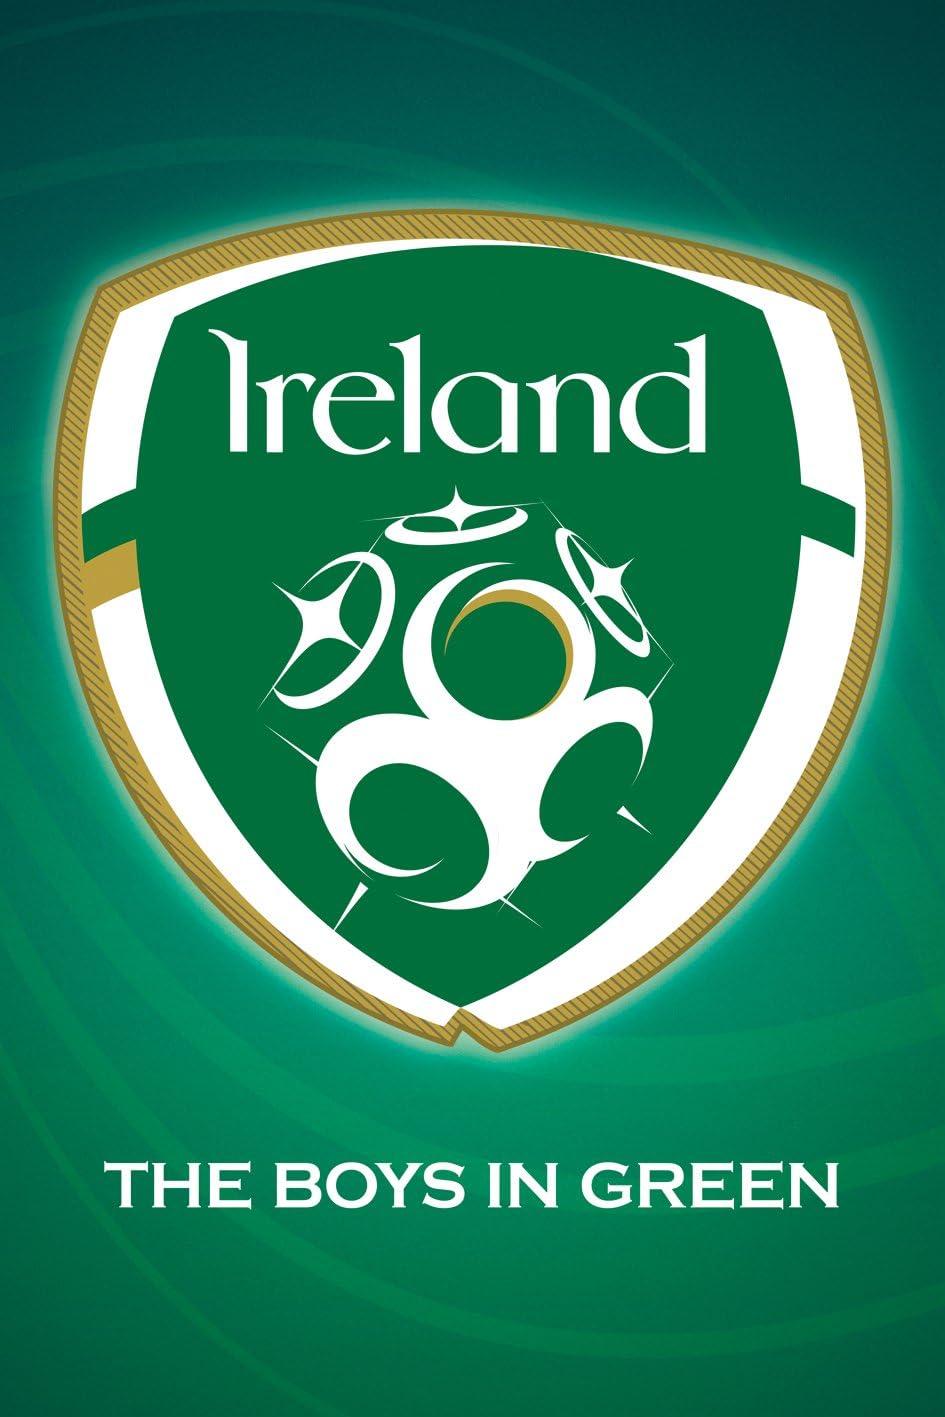 Sports Fan Soccer Football Poster Print 24x36 The Boys in Green gb Republic of Ireland National Football Team Crest